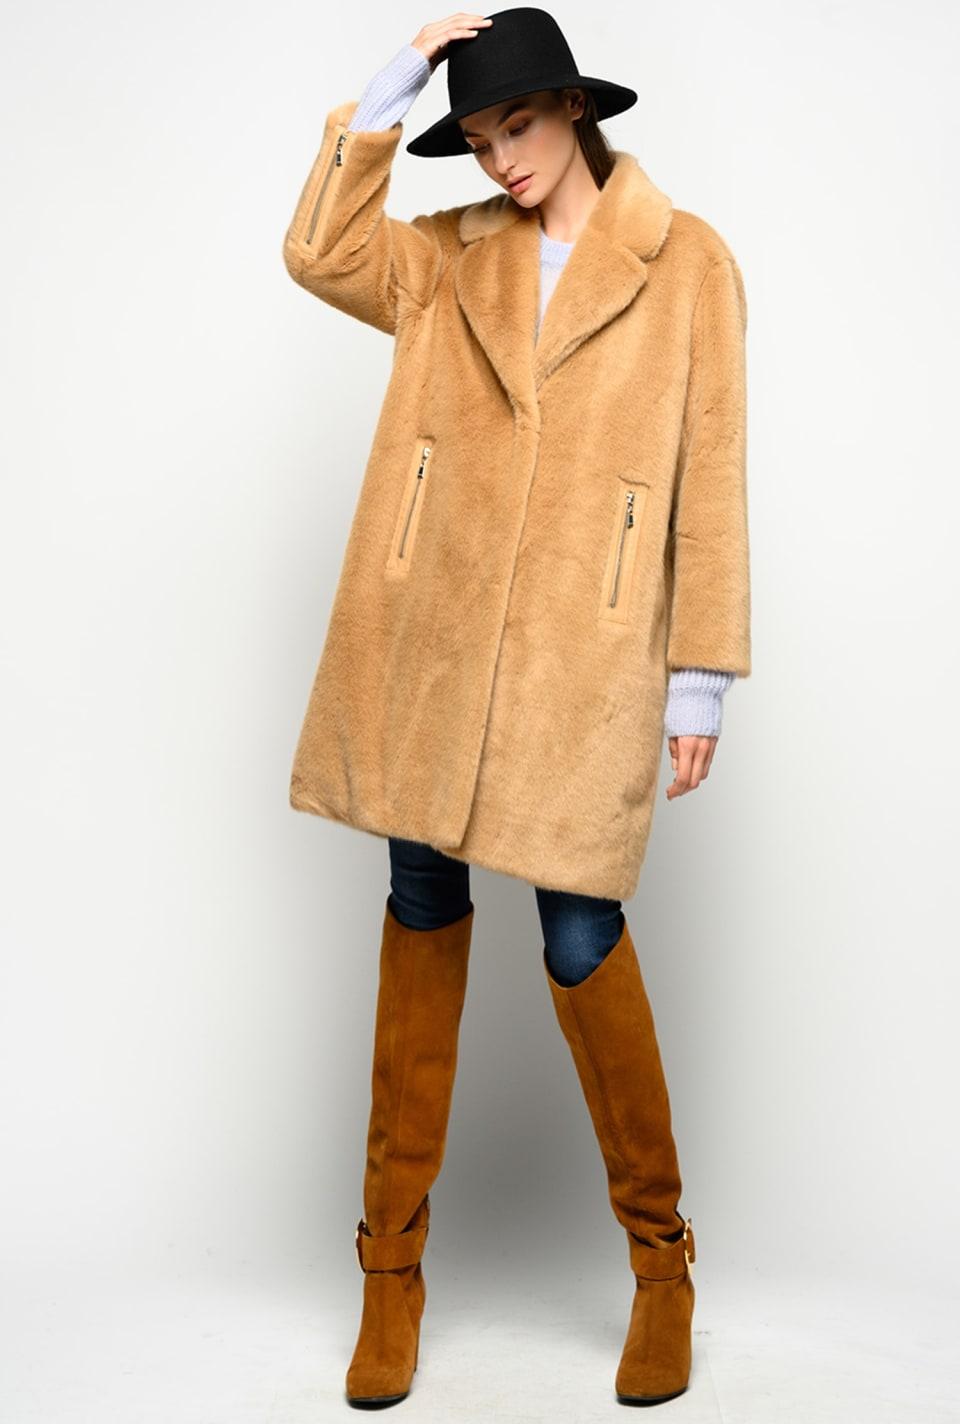 Mantel aus Nerzimitat - Pinko